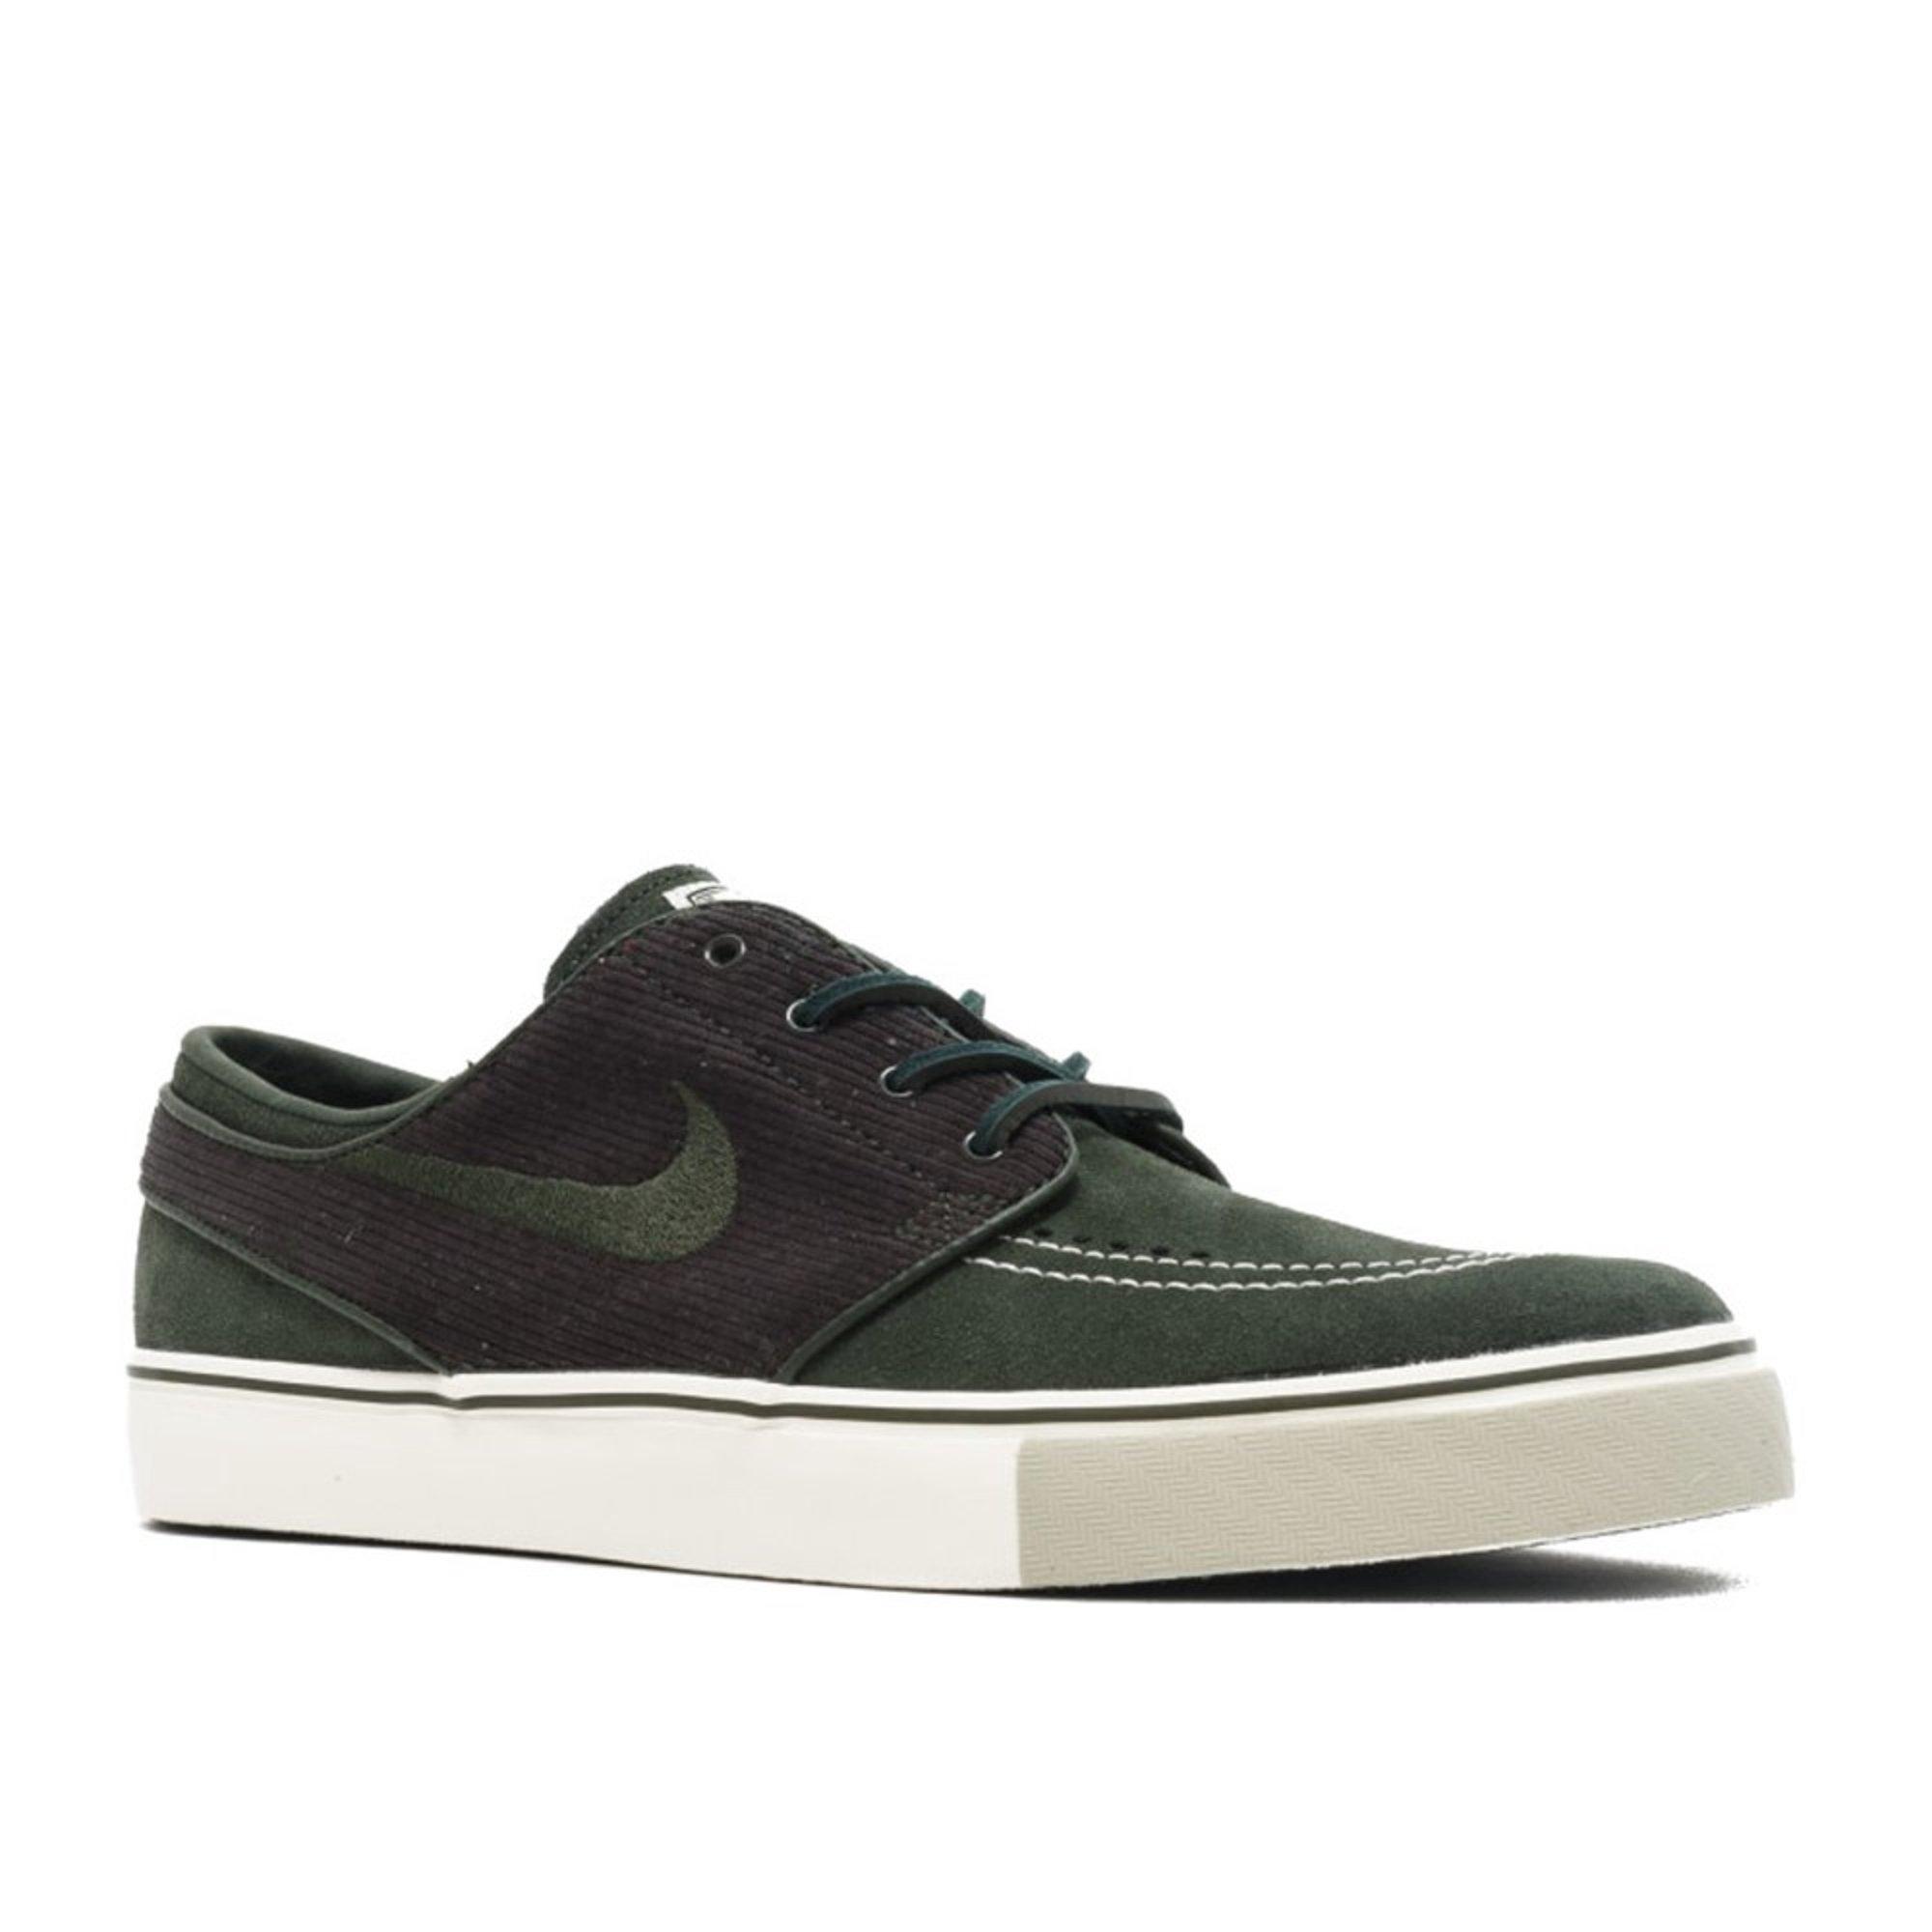 9265cc1331 Nike - Men - Zoom Stefan Janoski Og - 833603-331 - Size 11.5 ...